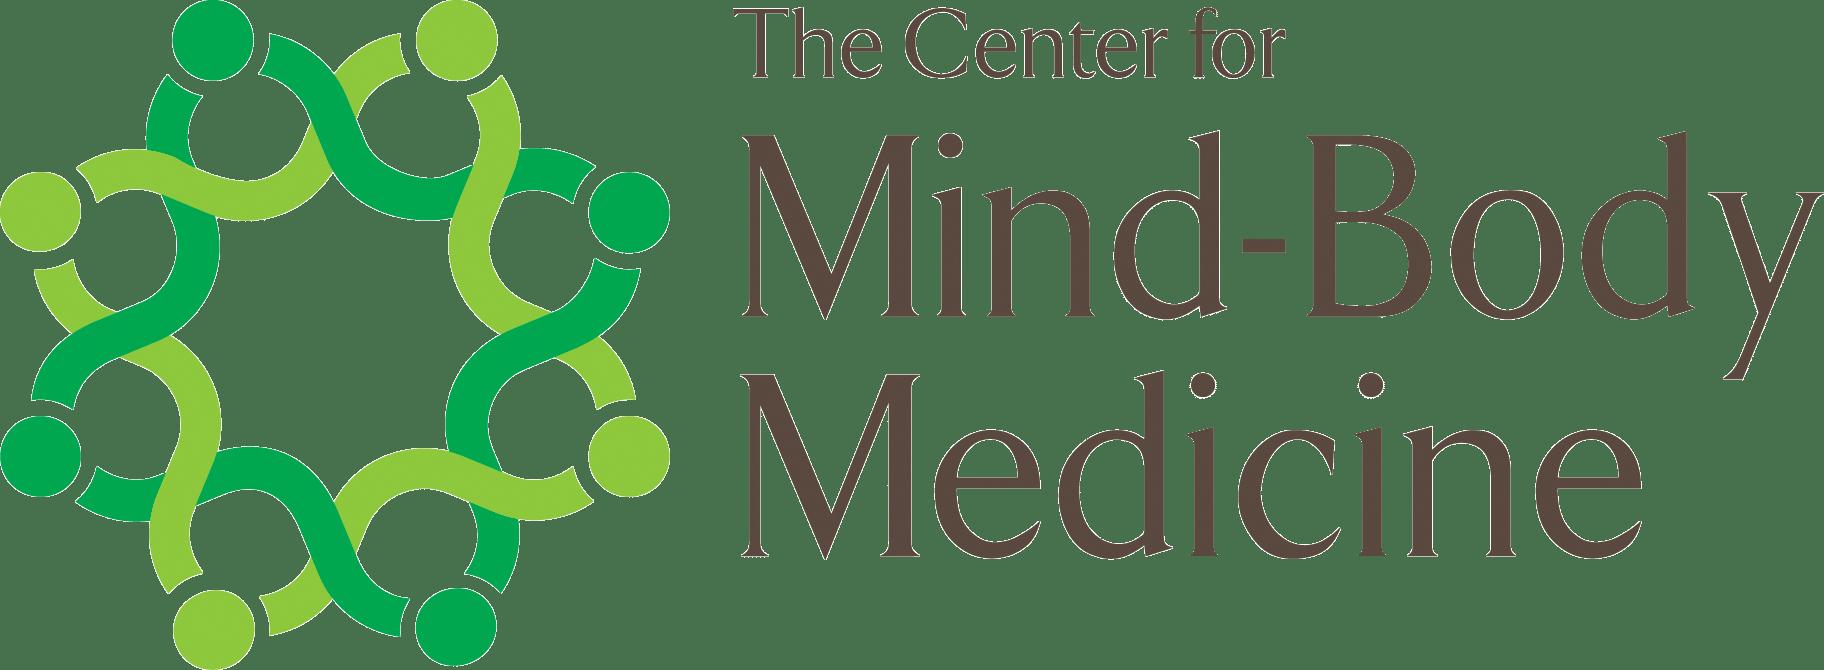 cmbm-logo-web.png